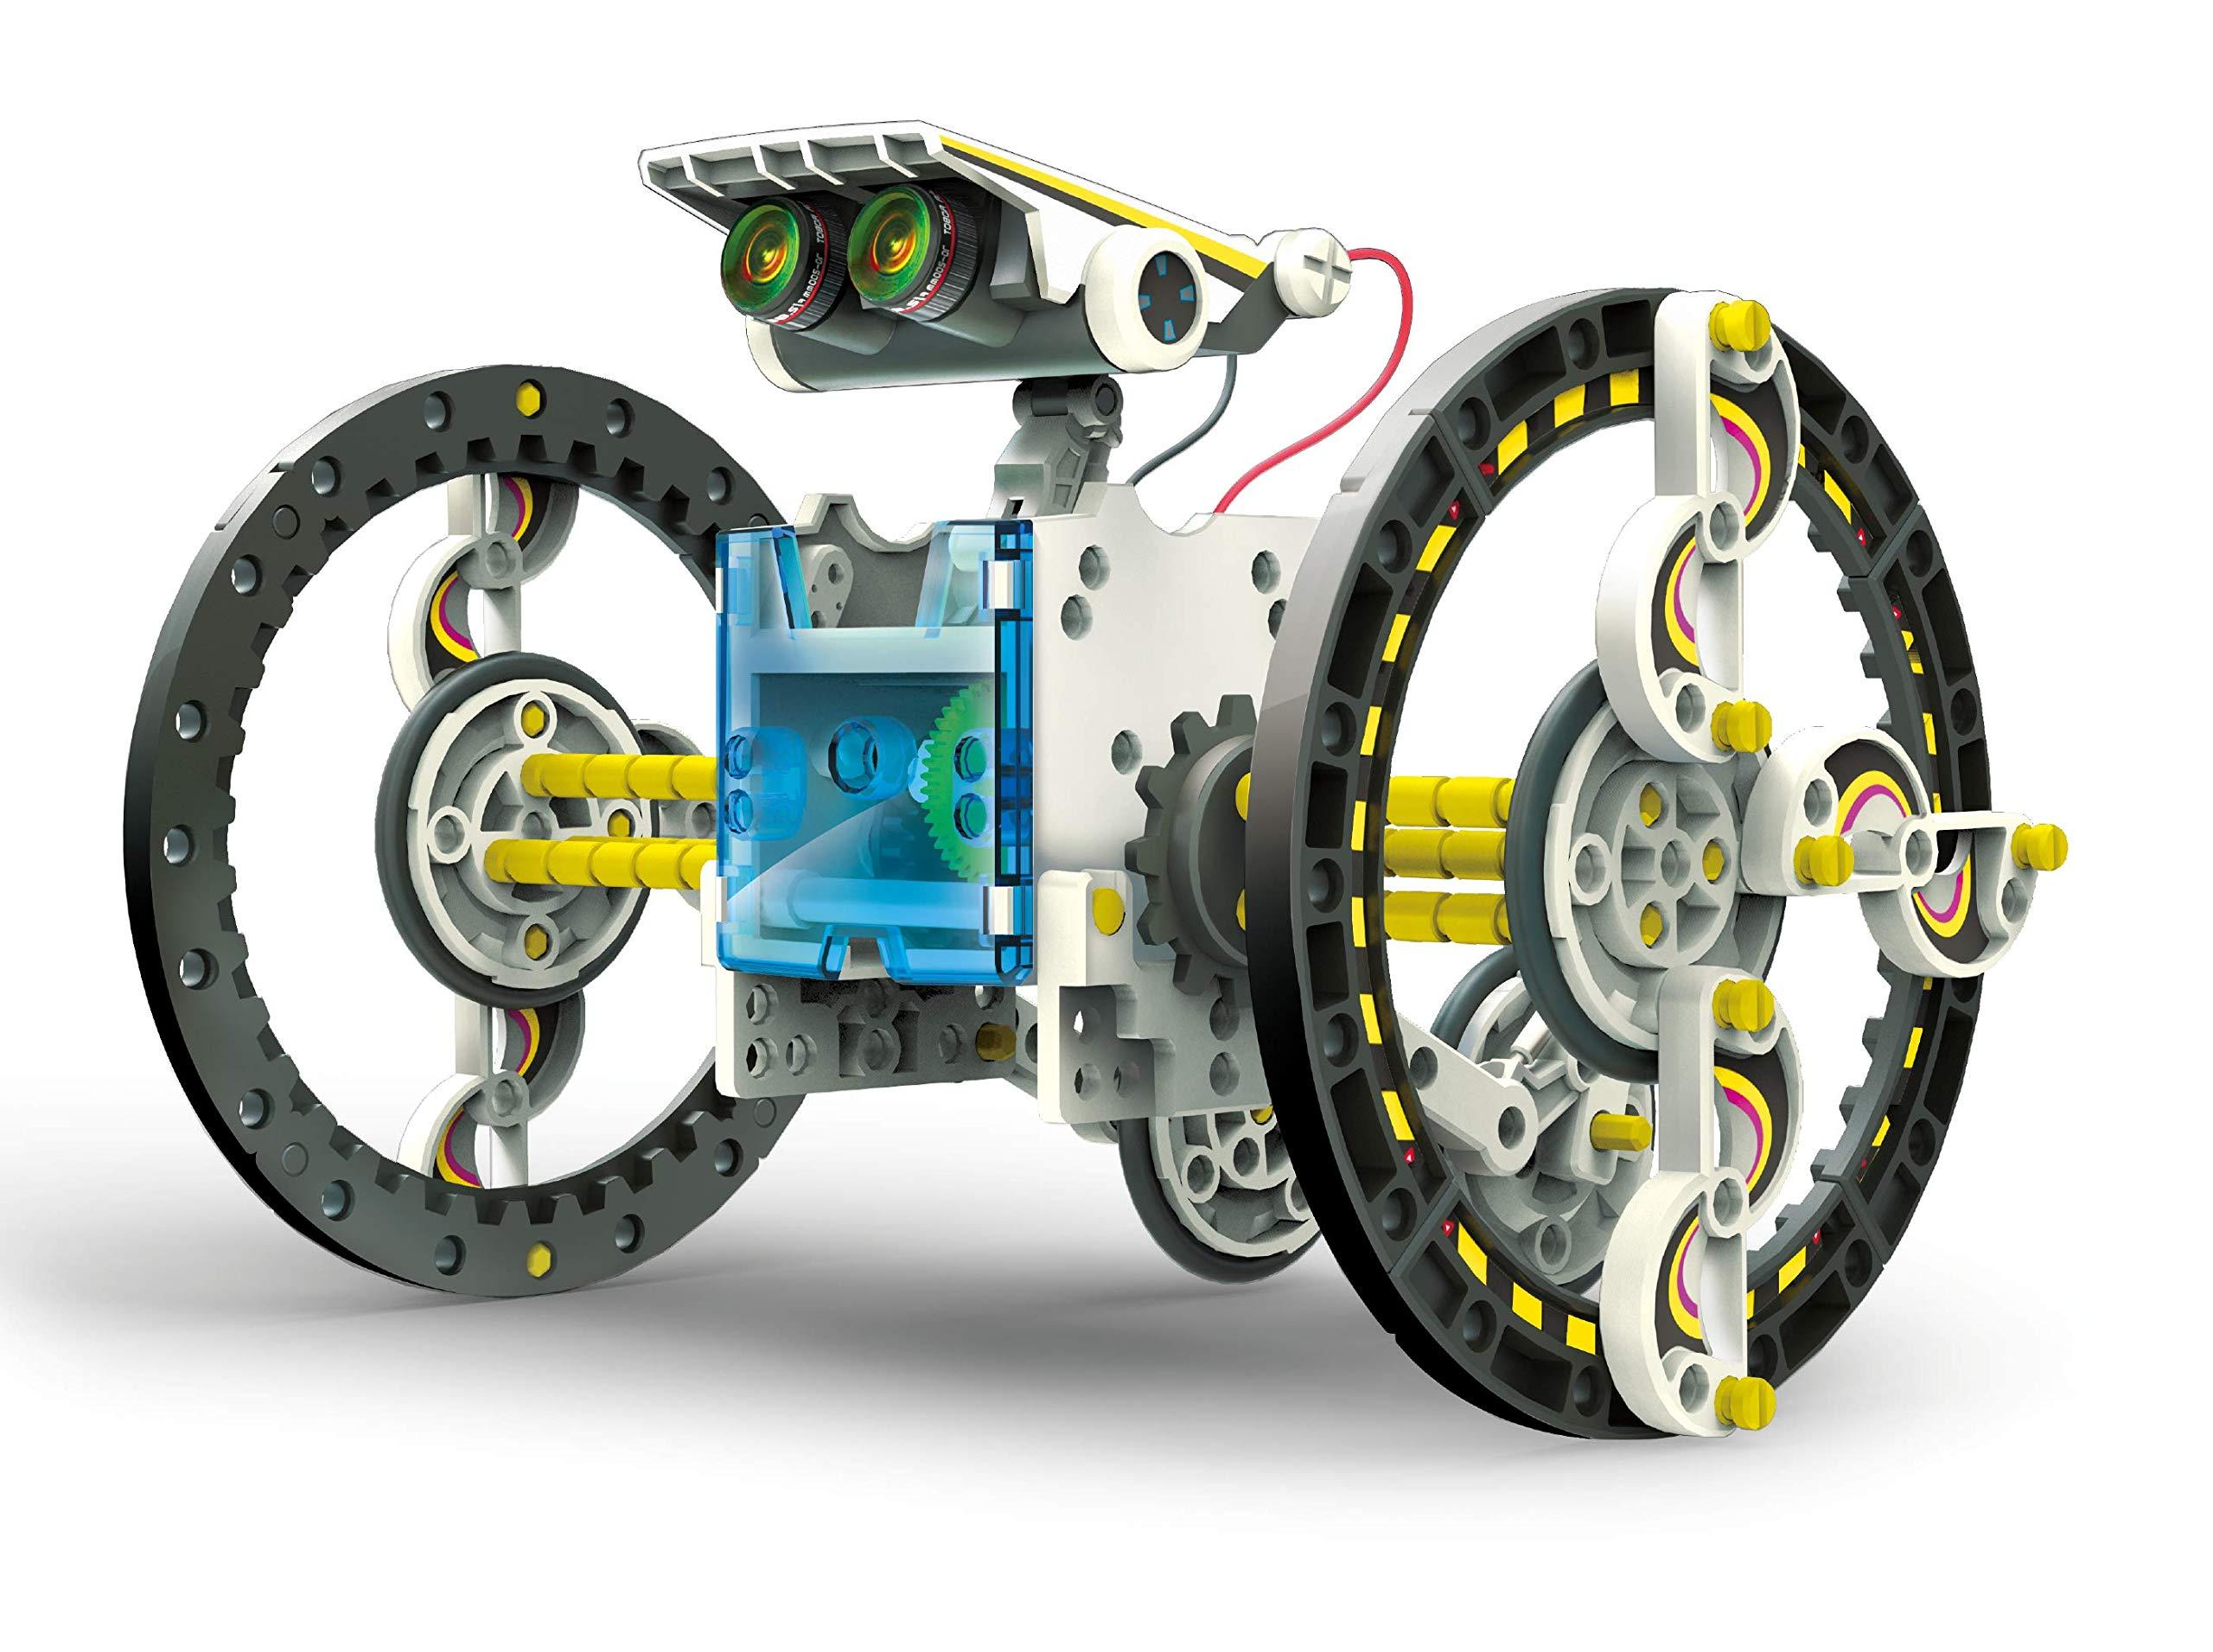 Elenco Teach Tech SolarBot Transforming Solar powered ...